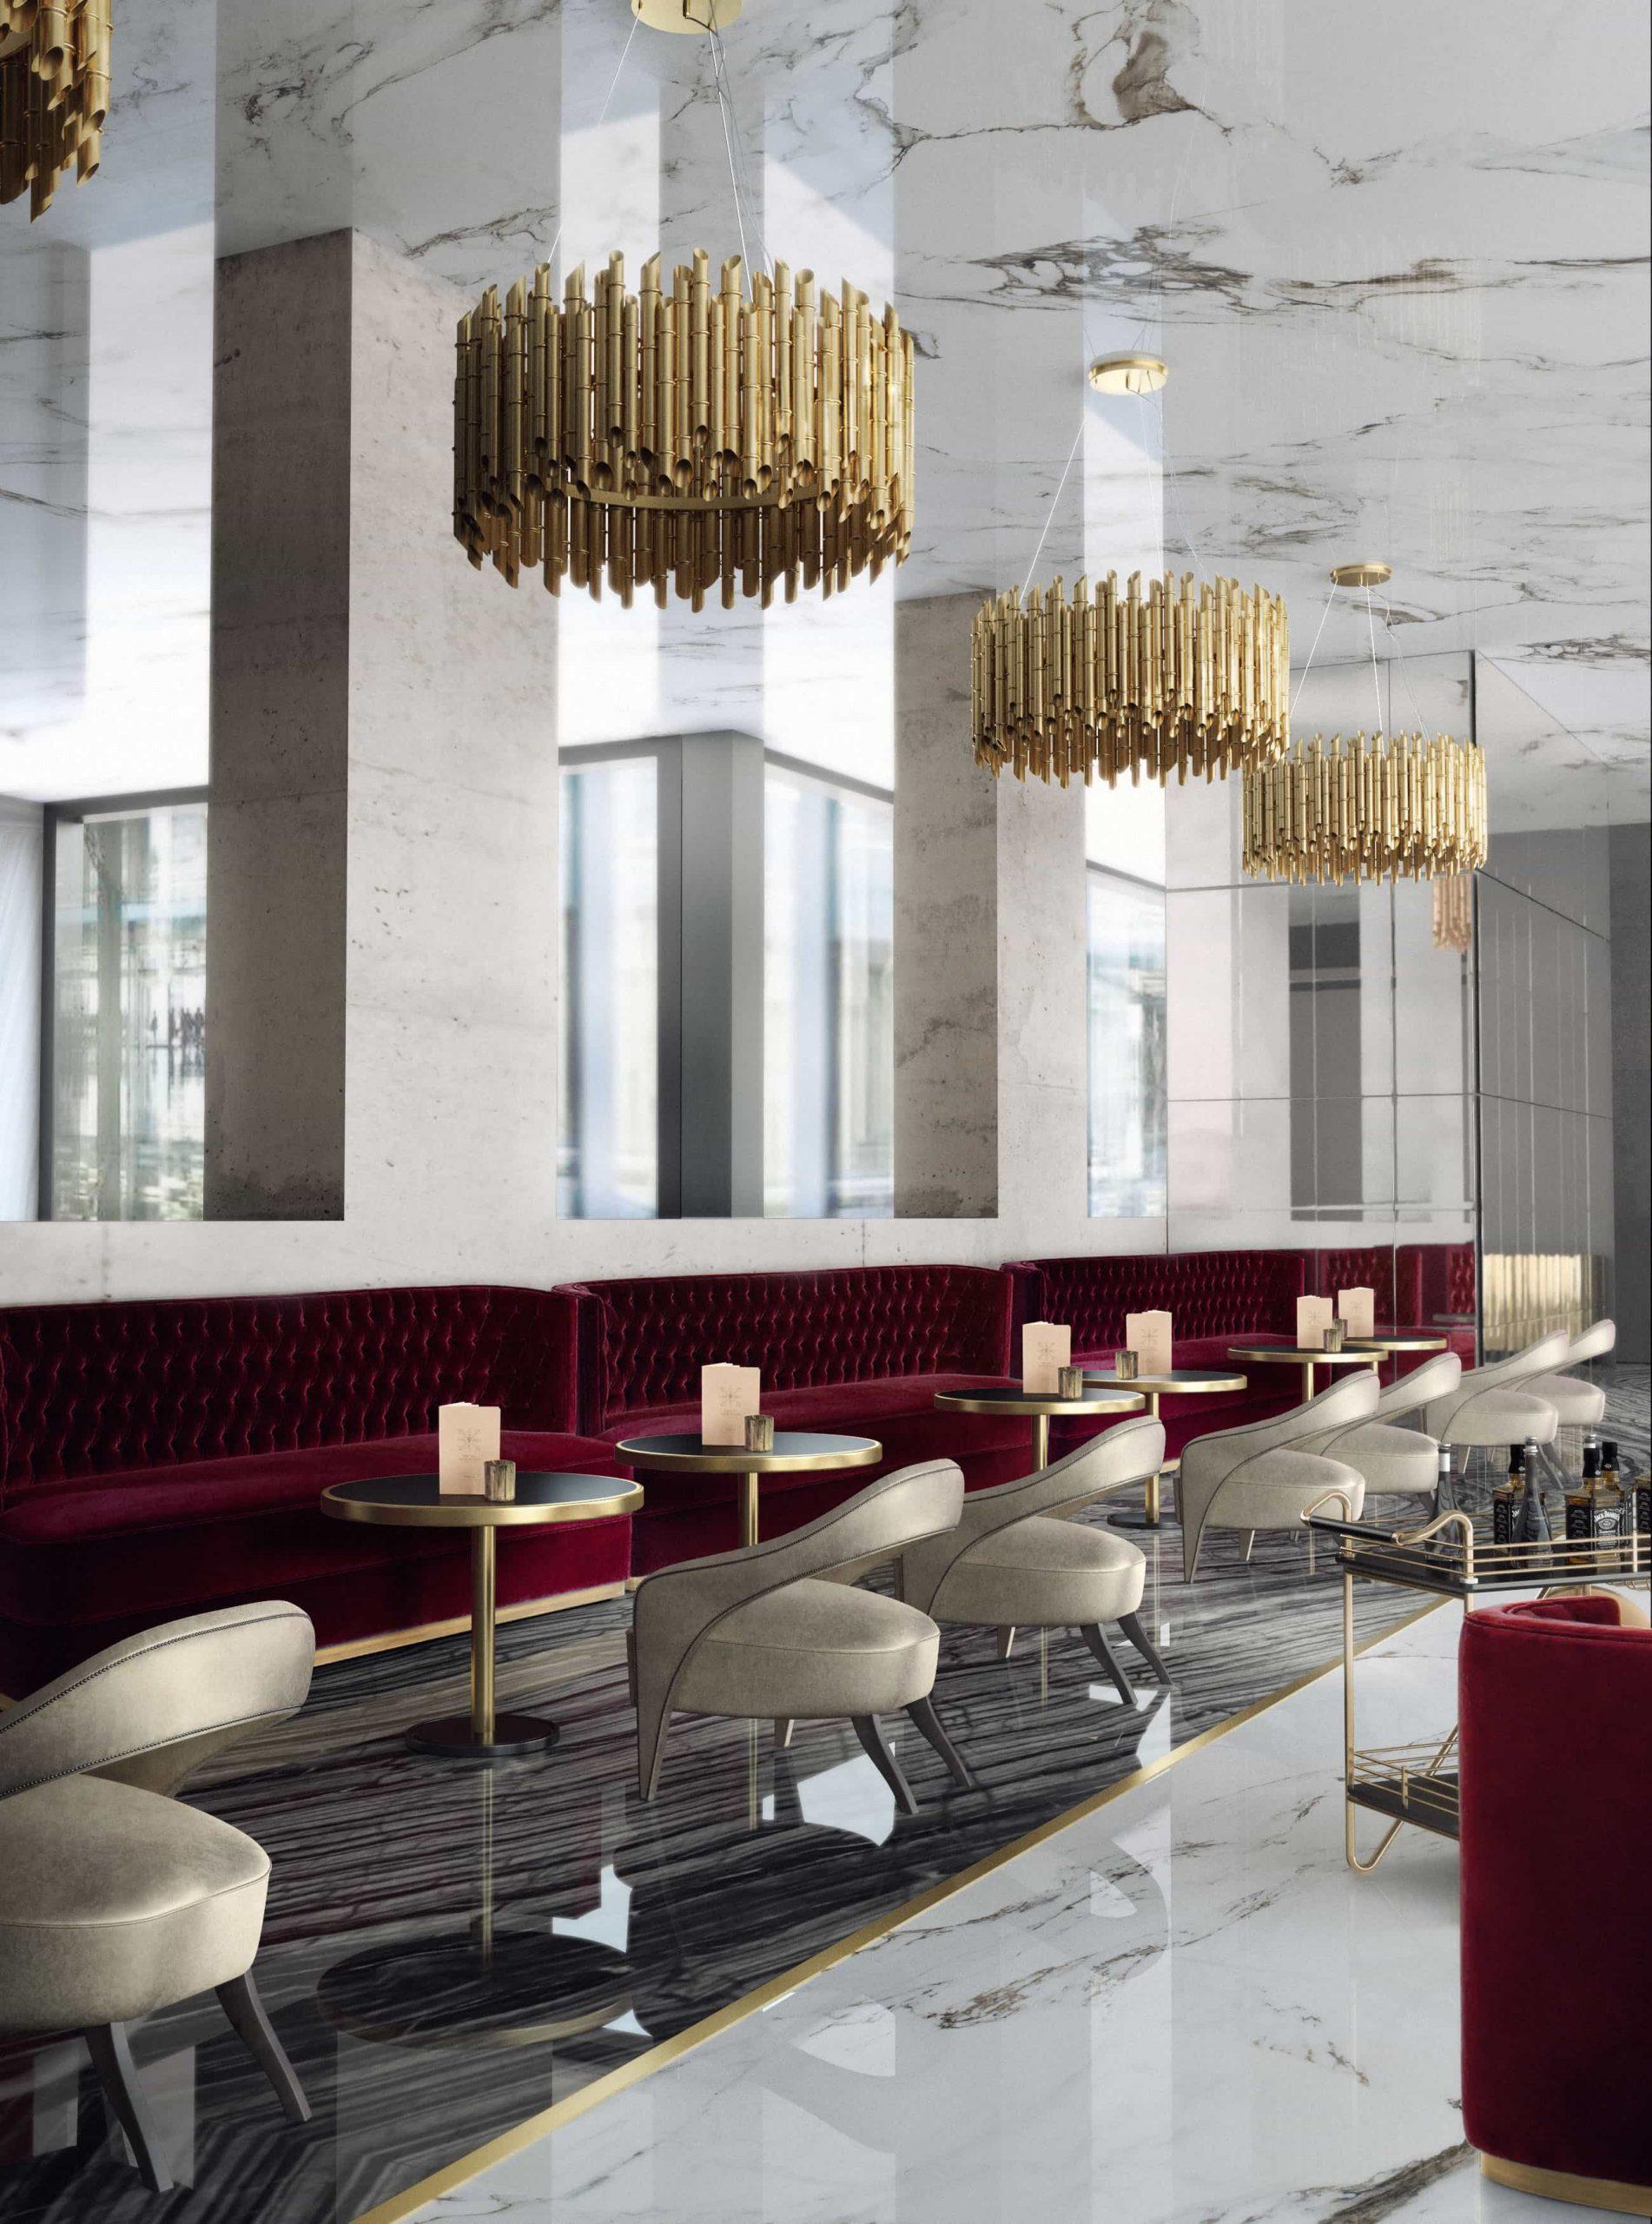 cenario_restaurante-brabbu-lighting-stores